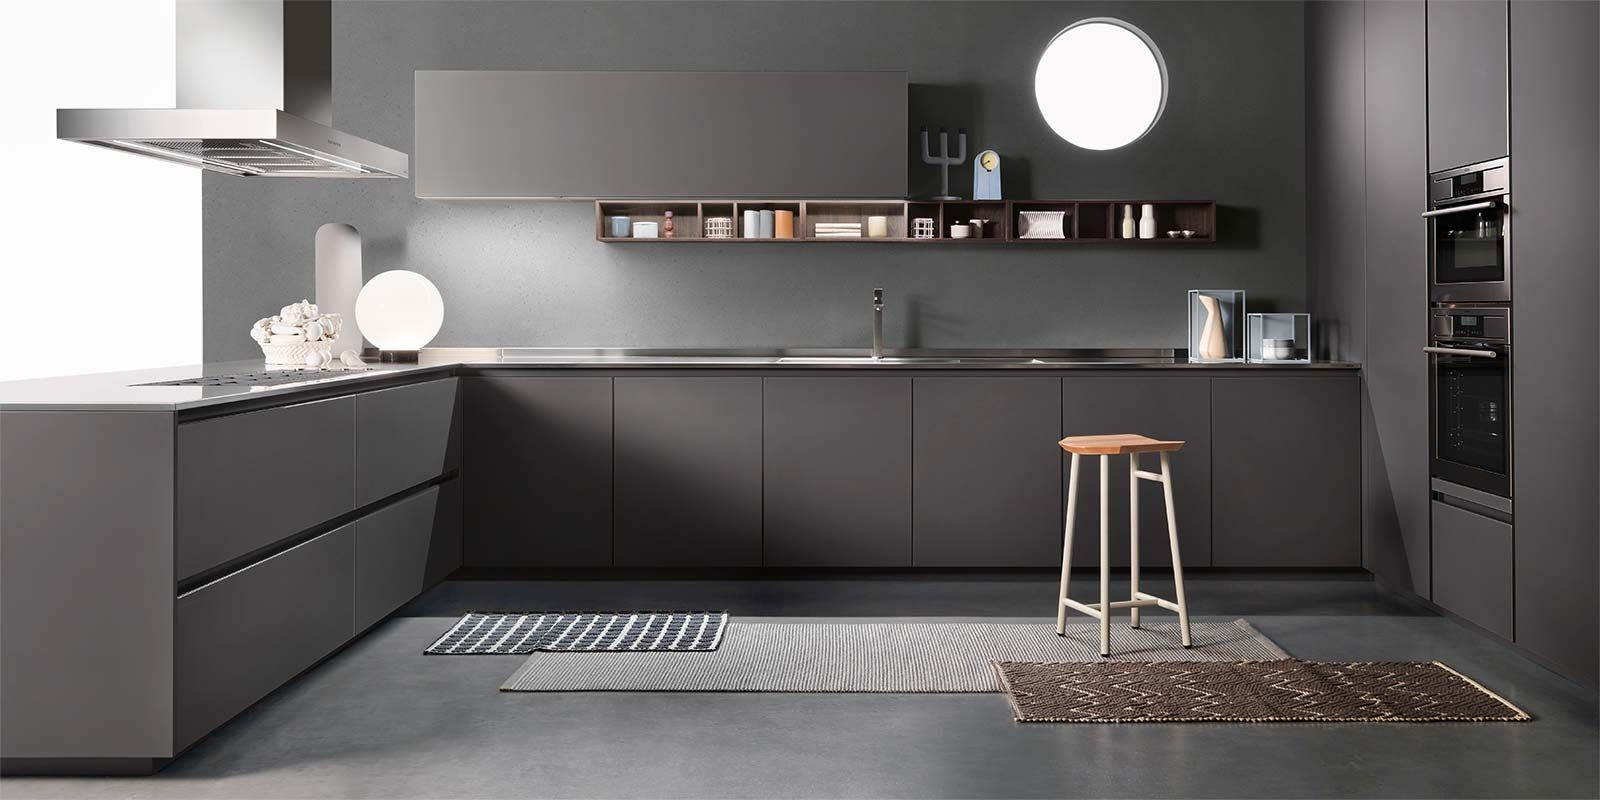 Italian Modern Design Kitchens - One by Ernestomeda | Kitchens ...